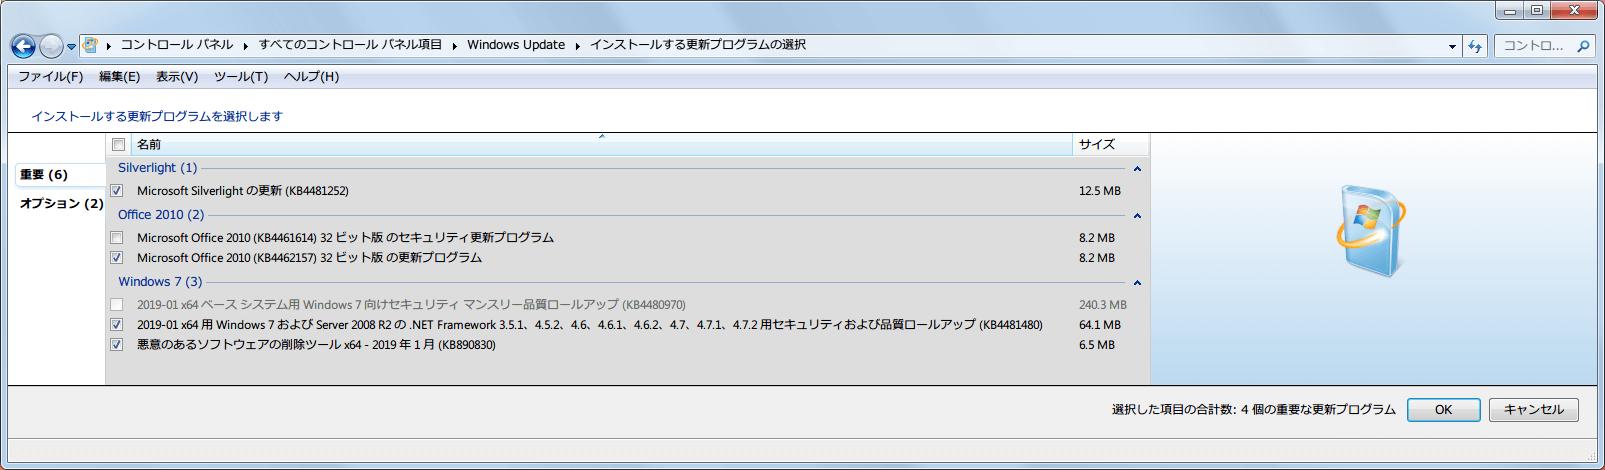 Windows 7 64bit Windows Update 重要 2019年1月分リスト KB4480970 非表示